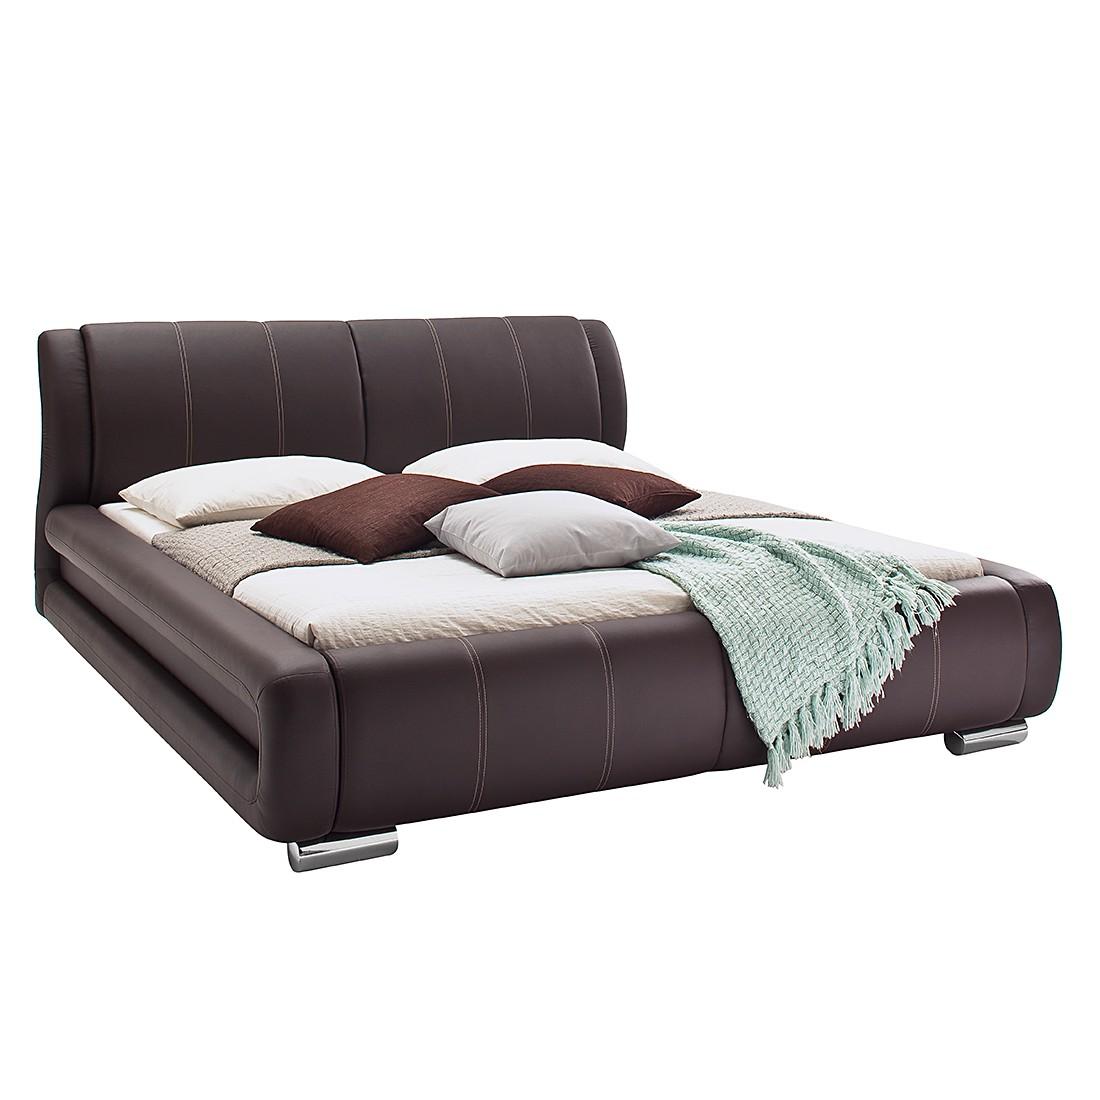 Lit capitonné Bolzano - Cuir synthétique - 160 x 200cm, meise möbel